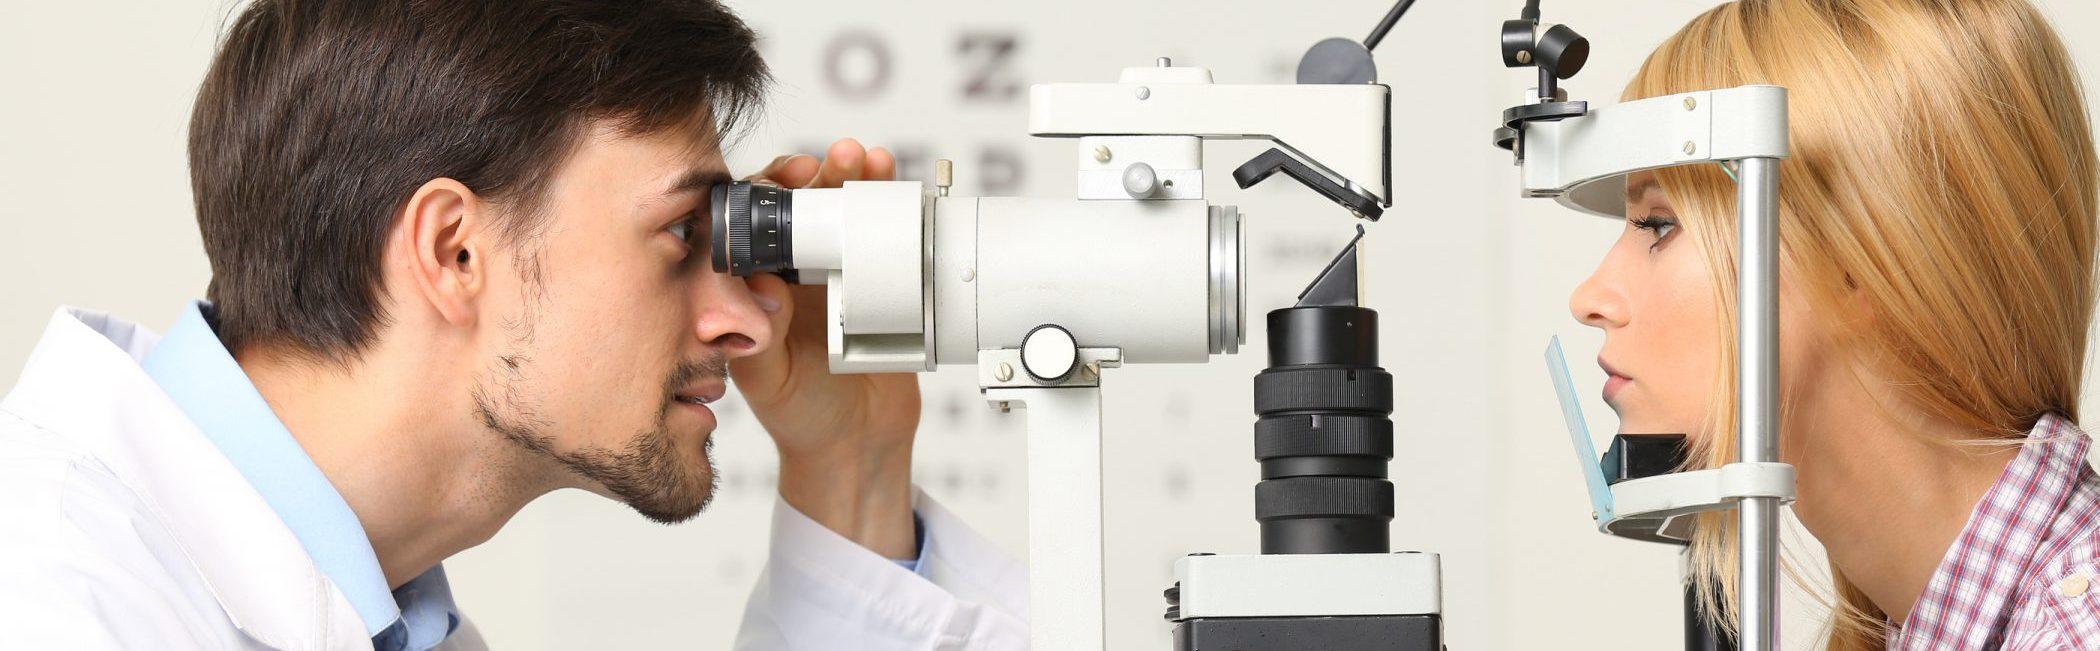 Optometrist oogcheck